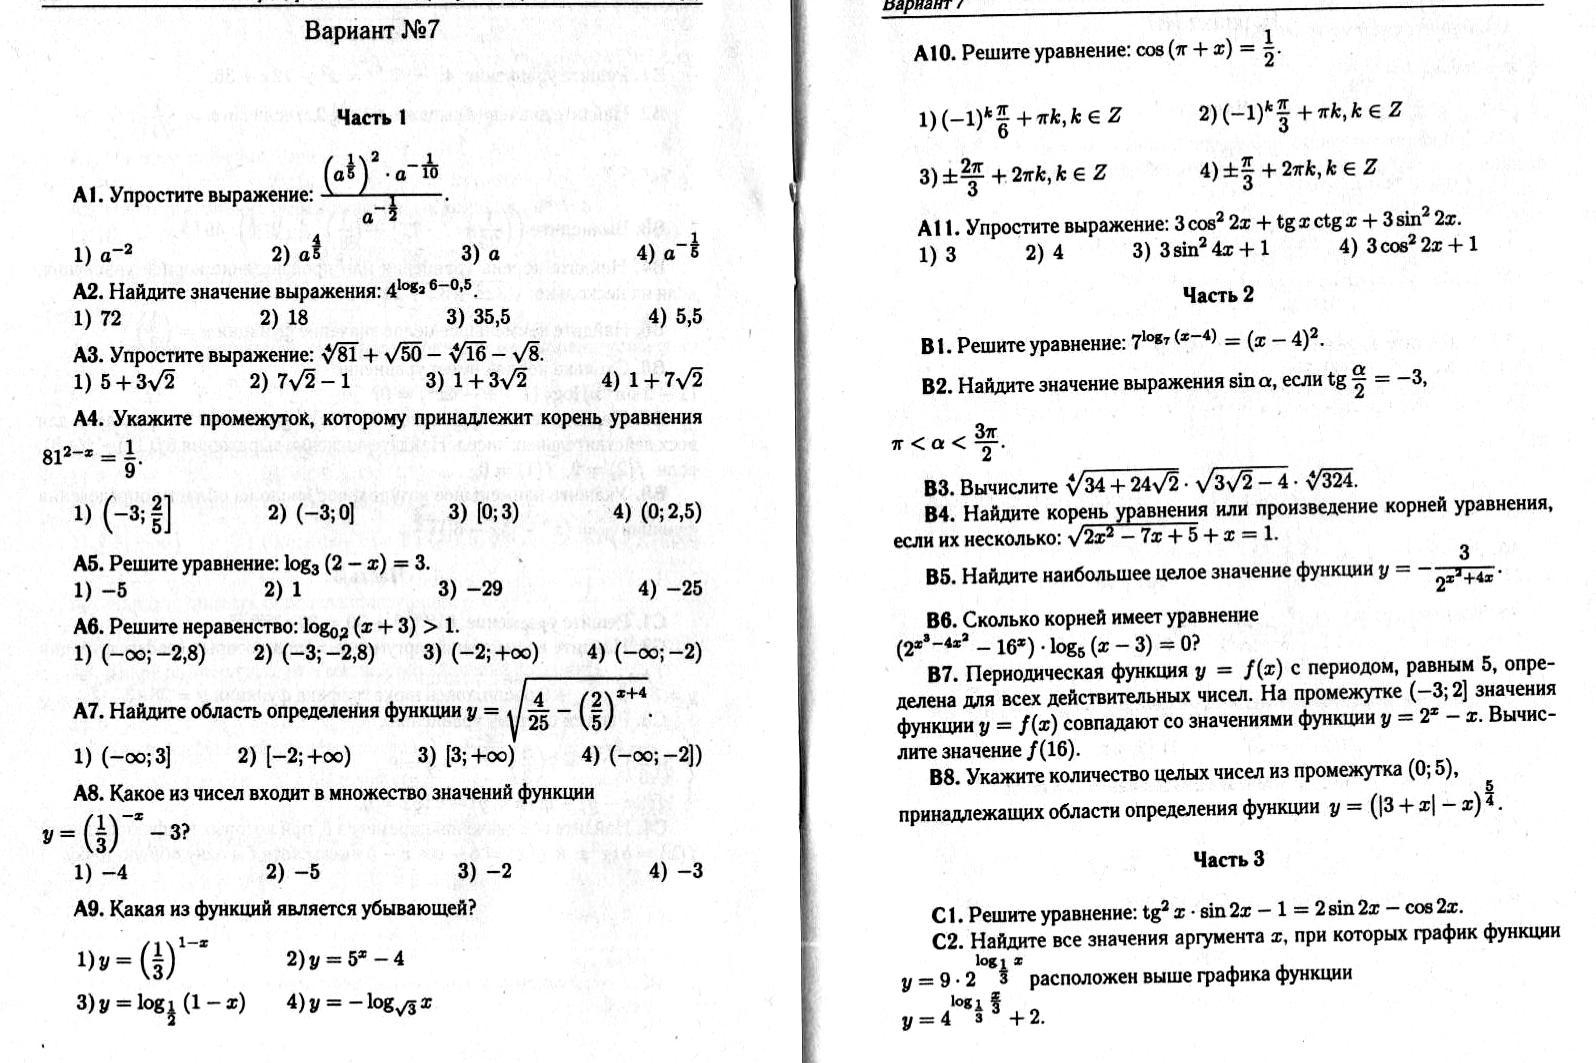 Онлайн тесты по алгебре 9 класс за 1 полугодие